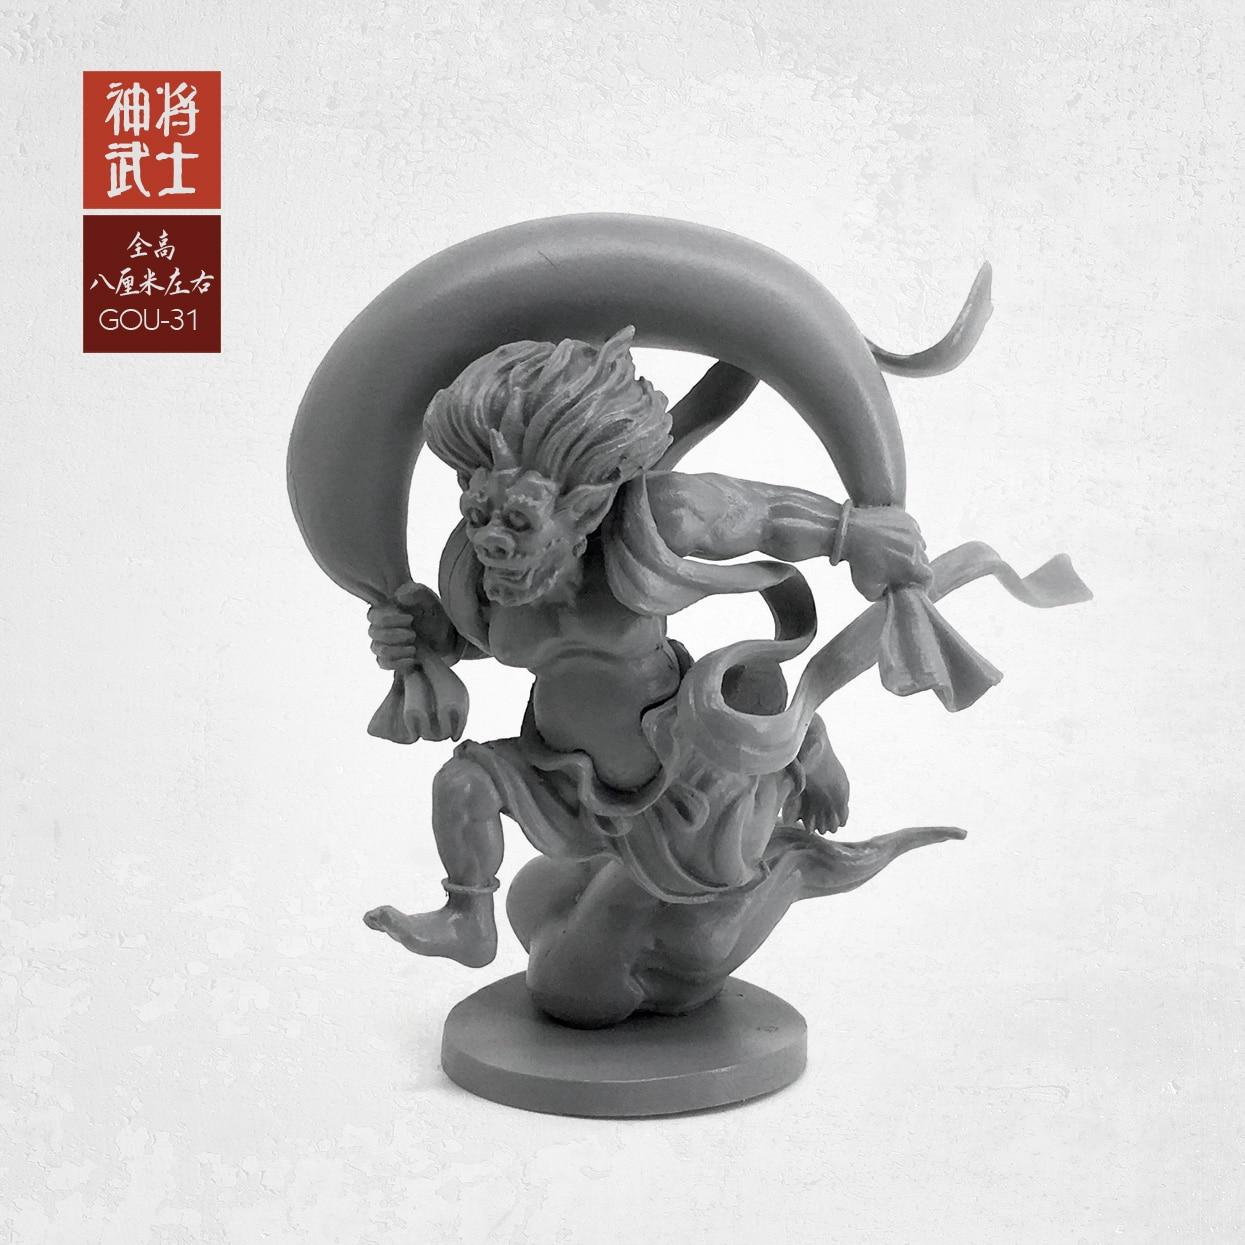 1/35 Figure Kits Model (50-60mm) Oriental Classical God Samurai Resin Soldier Gou-32